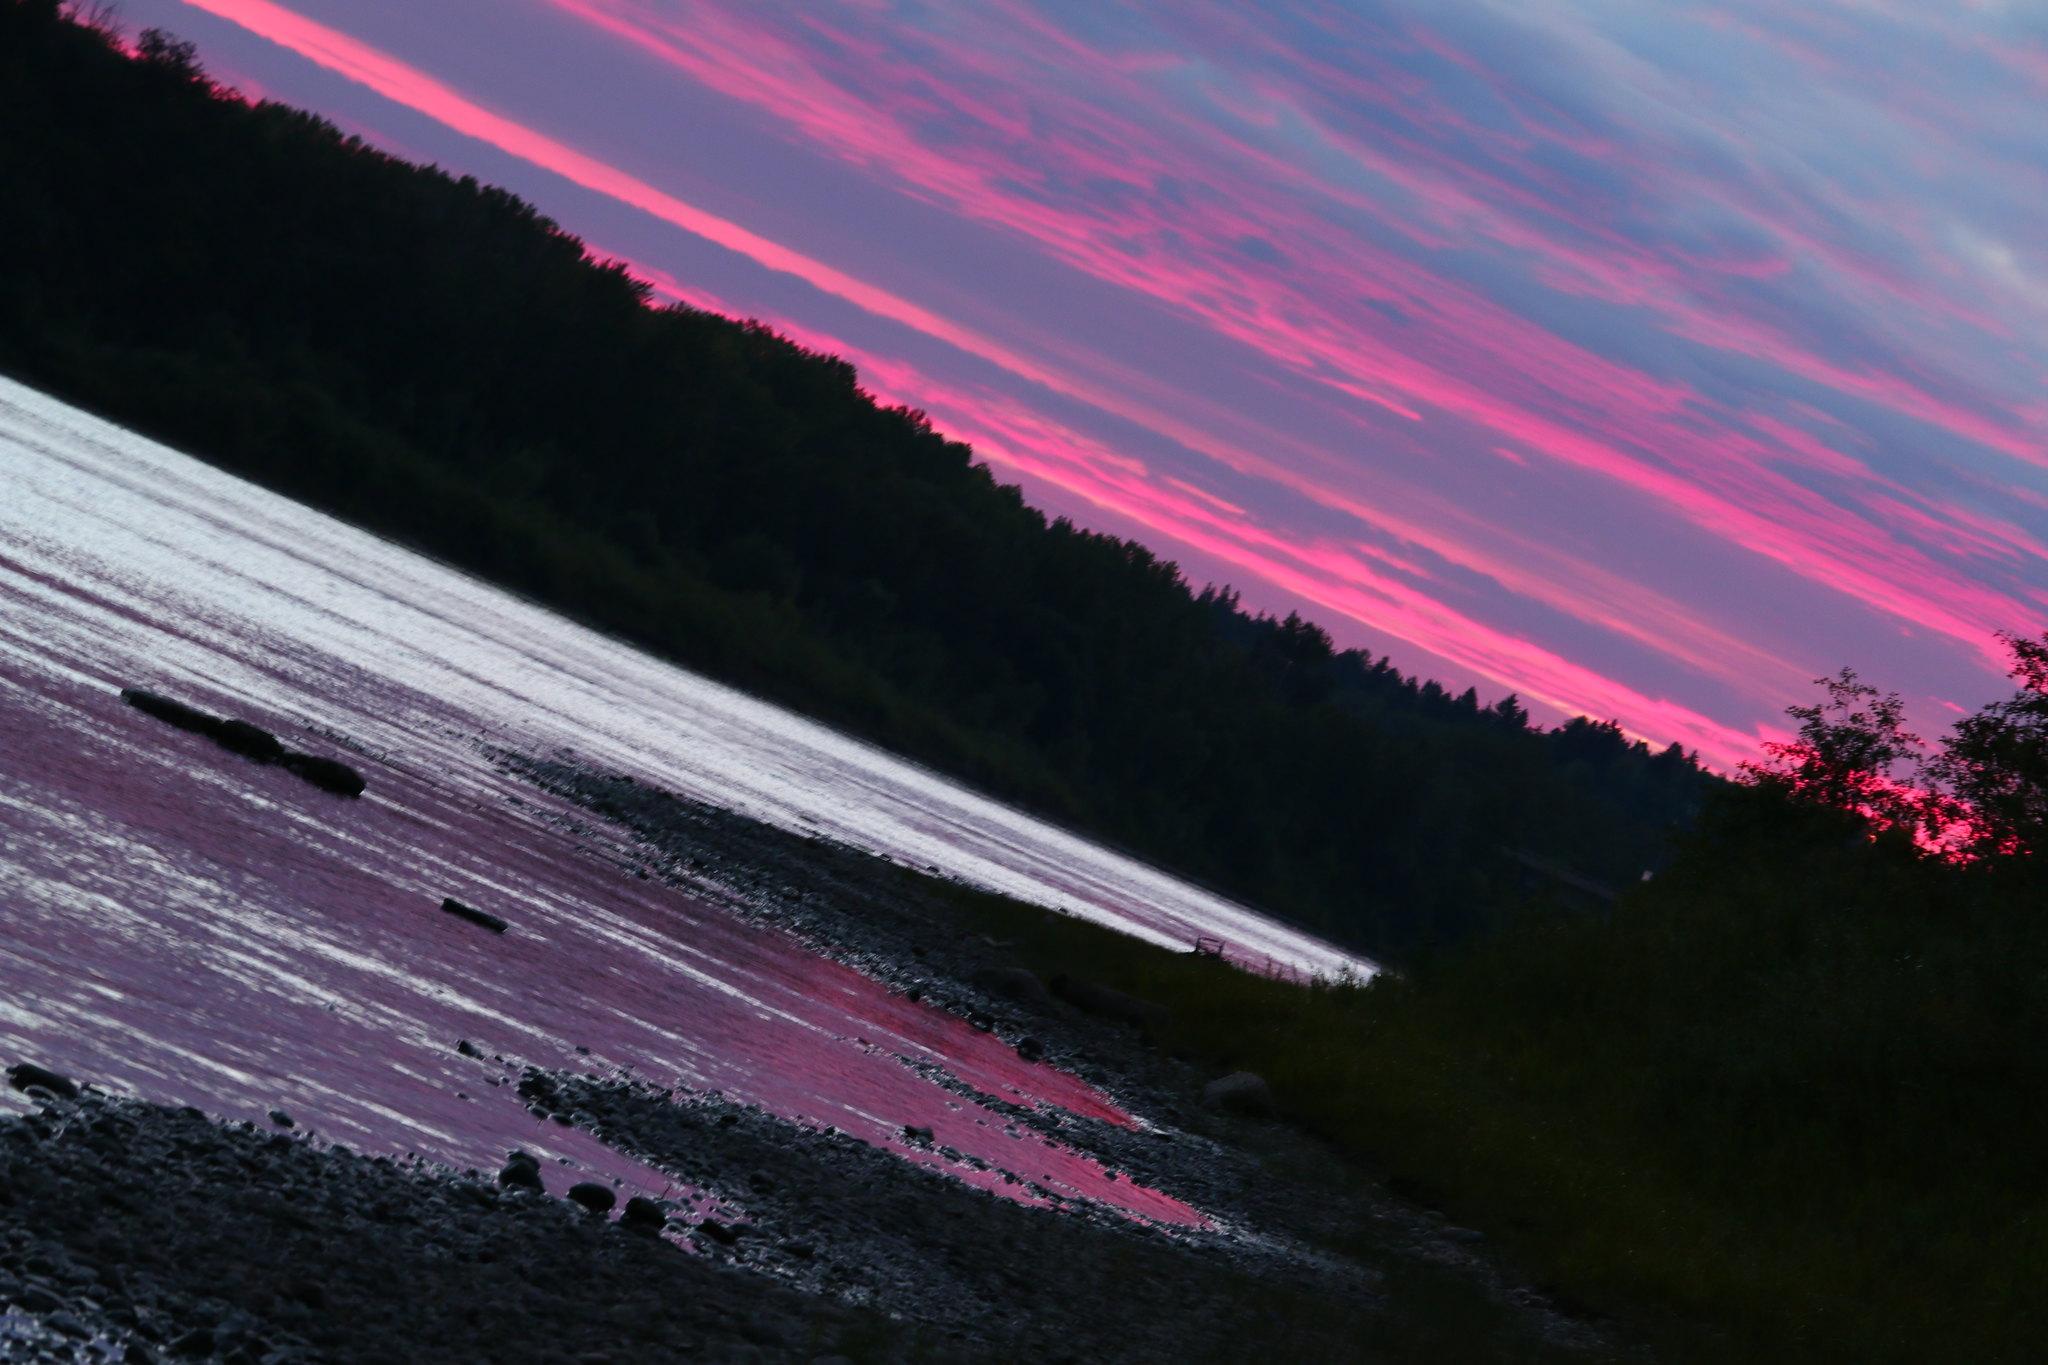 Pink Ribbons (SOTC 168/365)